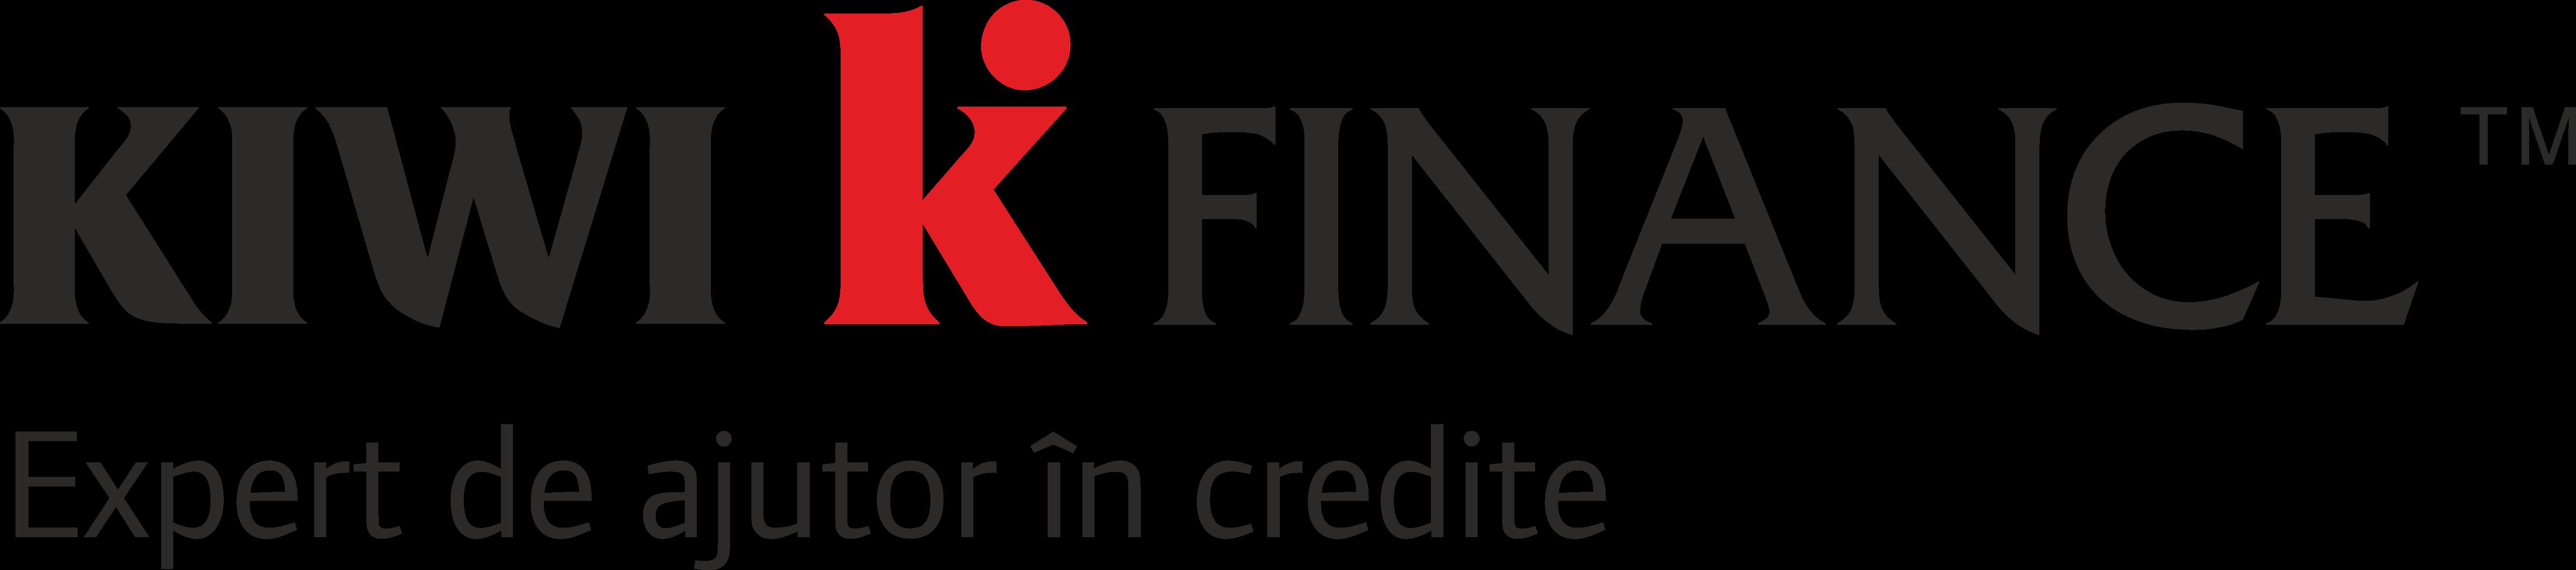 Kiwi Finance logo